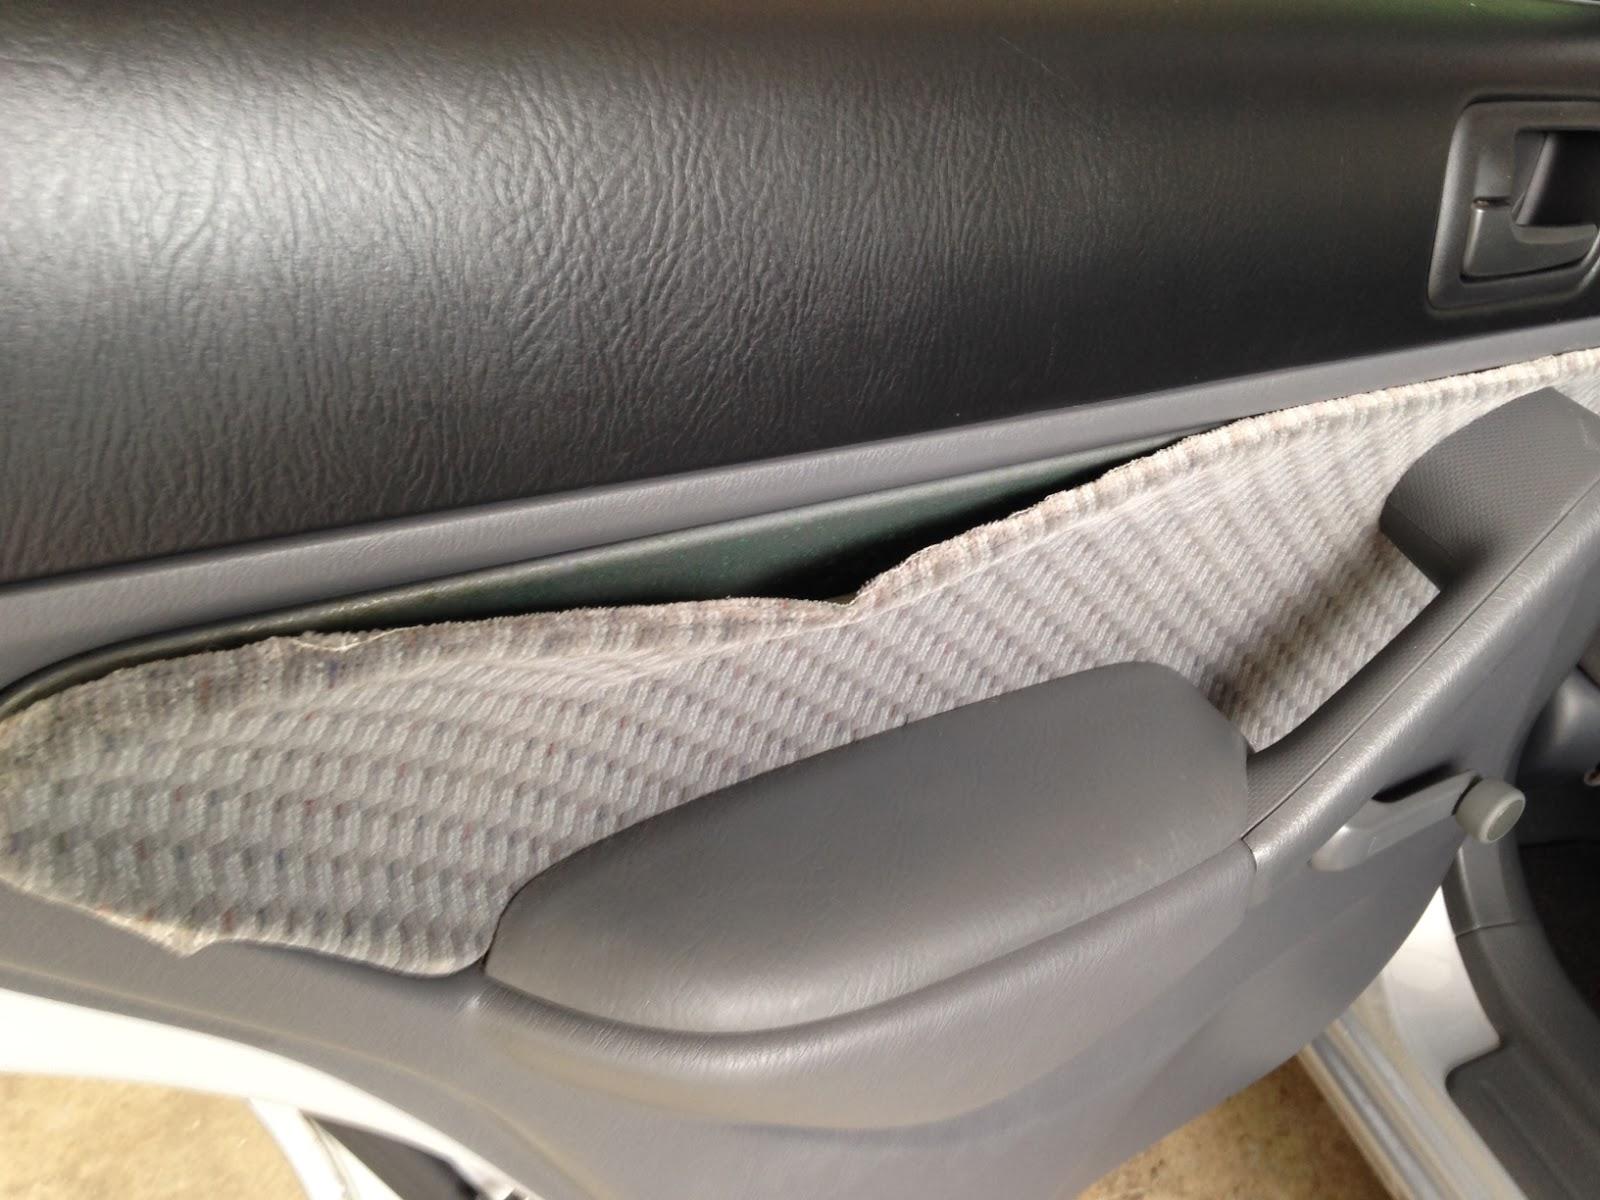 tamerlane 39 s thoughts upholstery glue. Black Bedroom Furniture Sets. Home Design Ideas